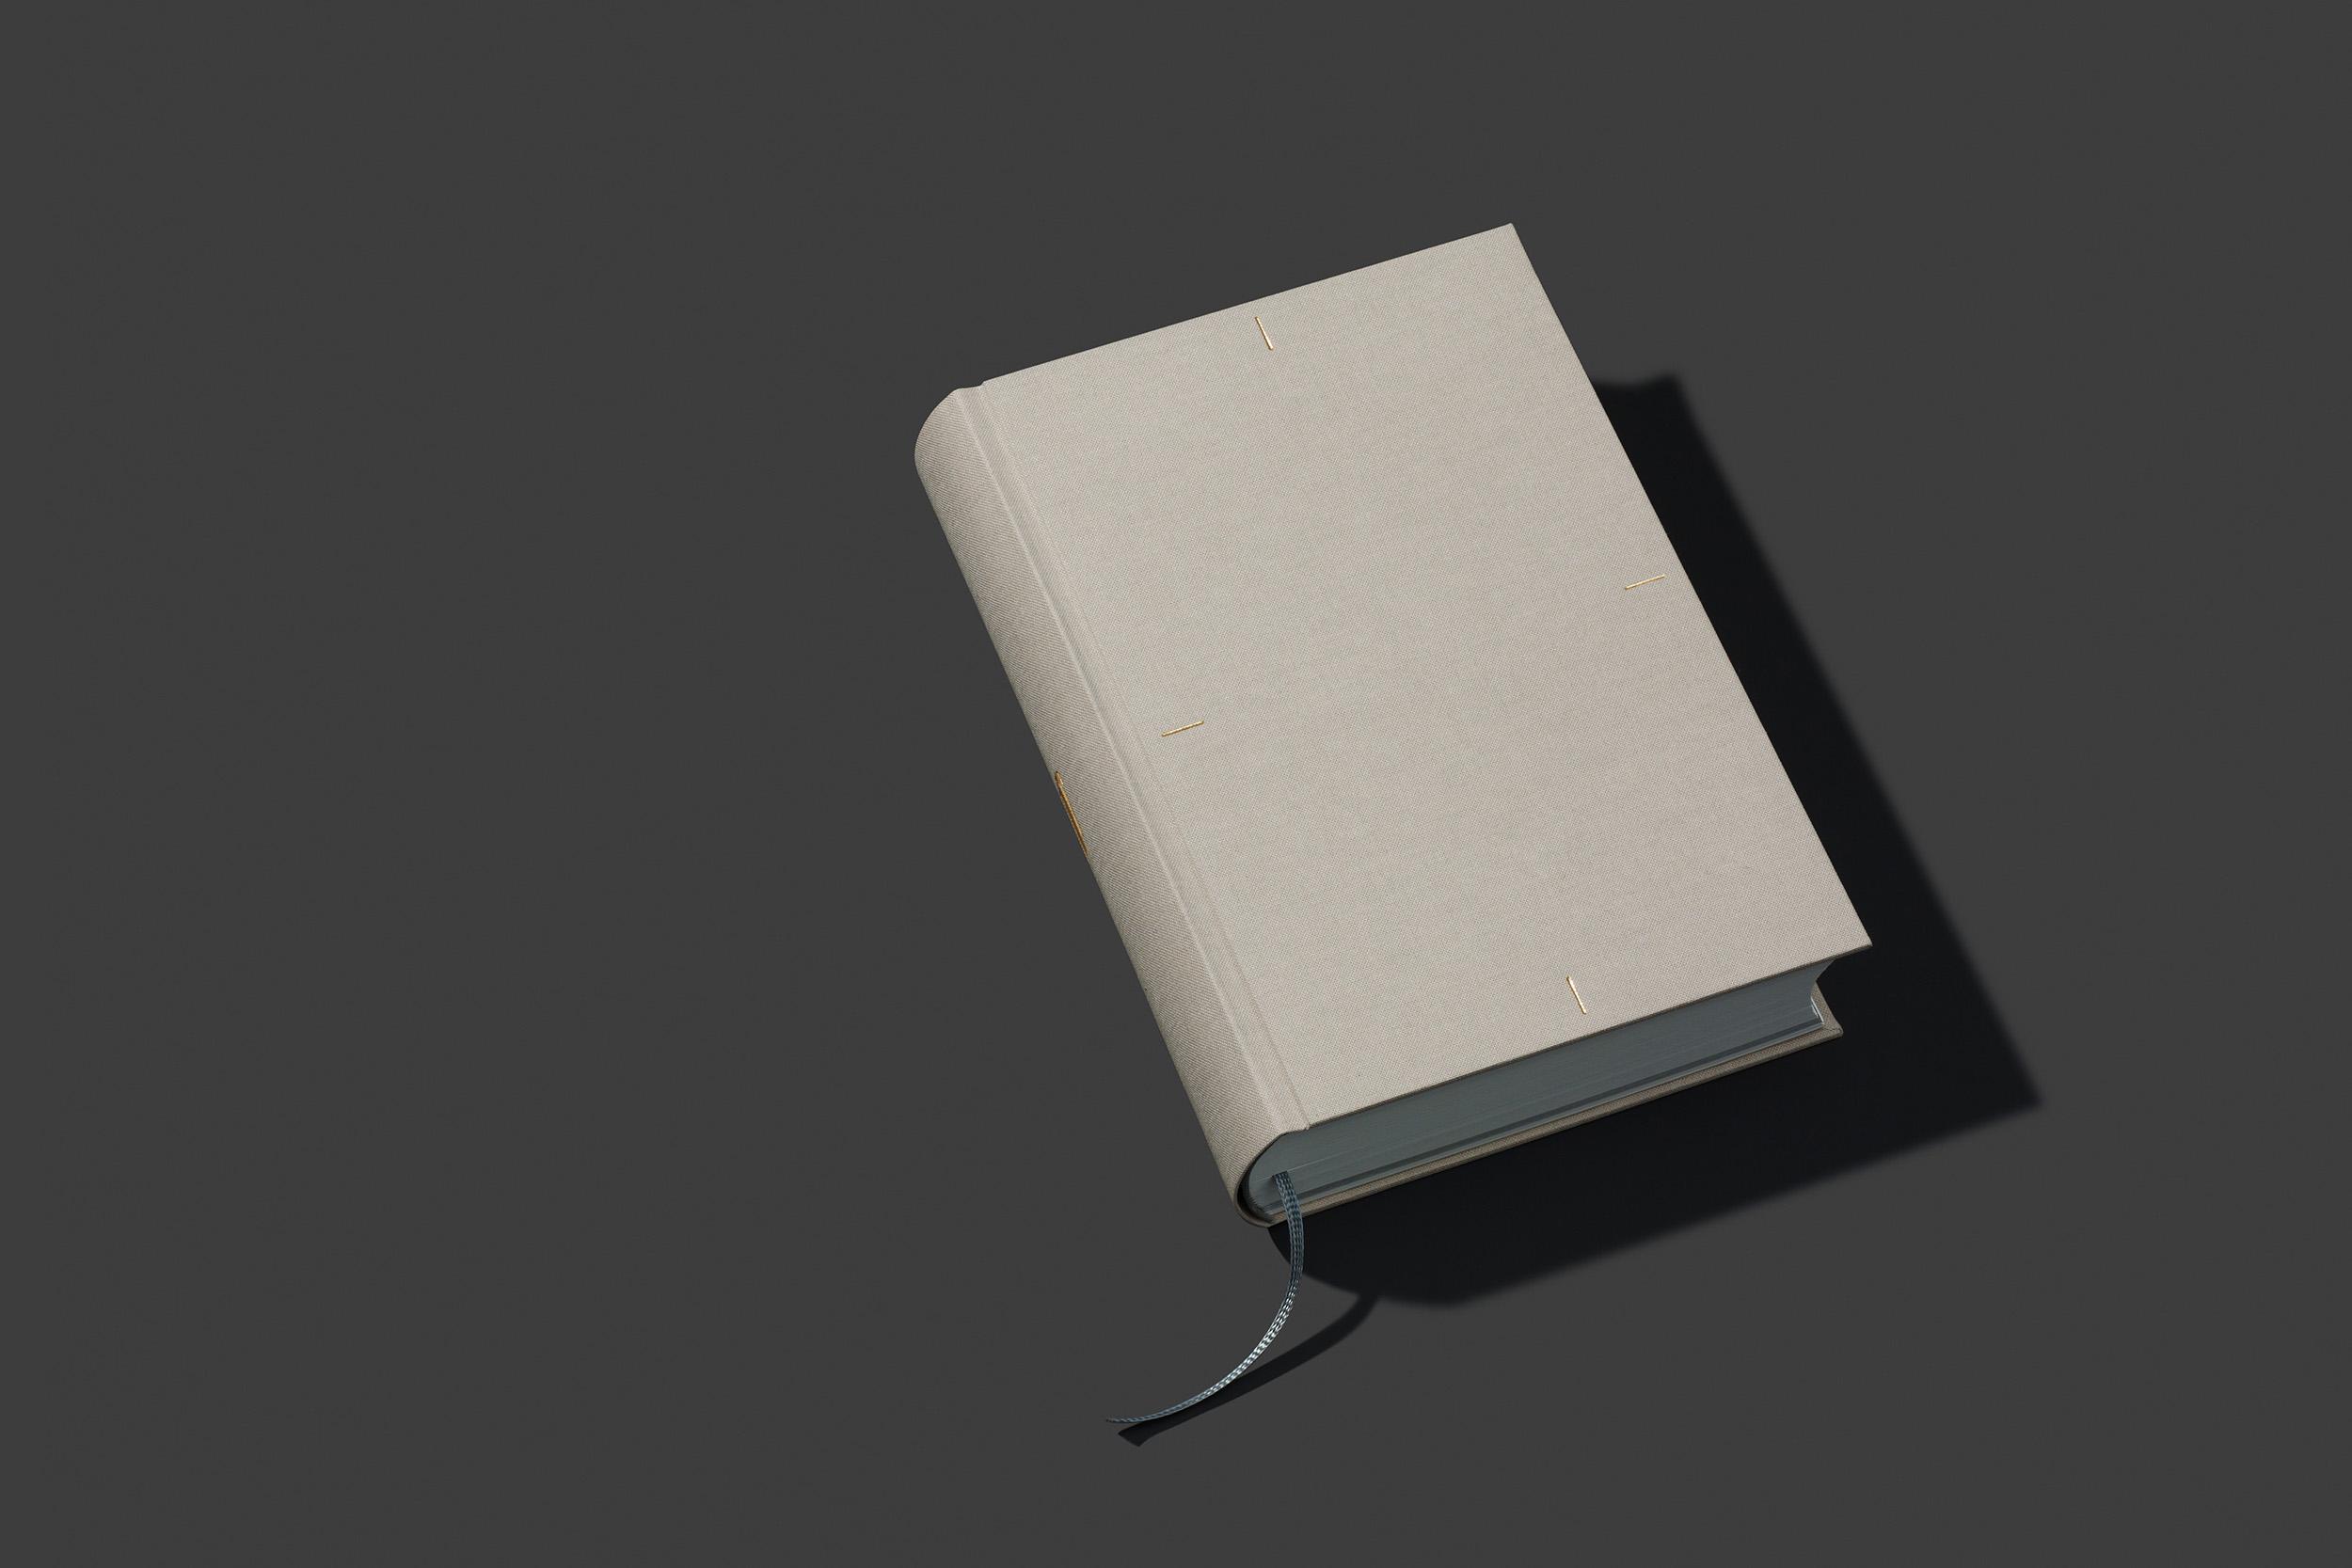 worthless_book_1-2.jpg